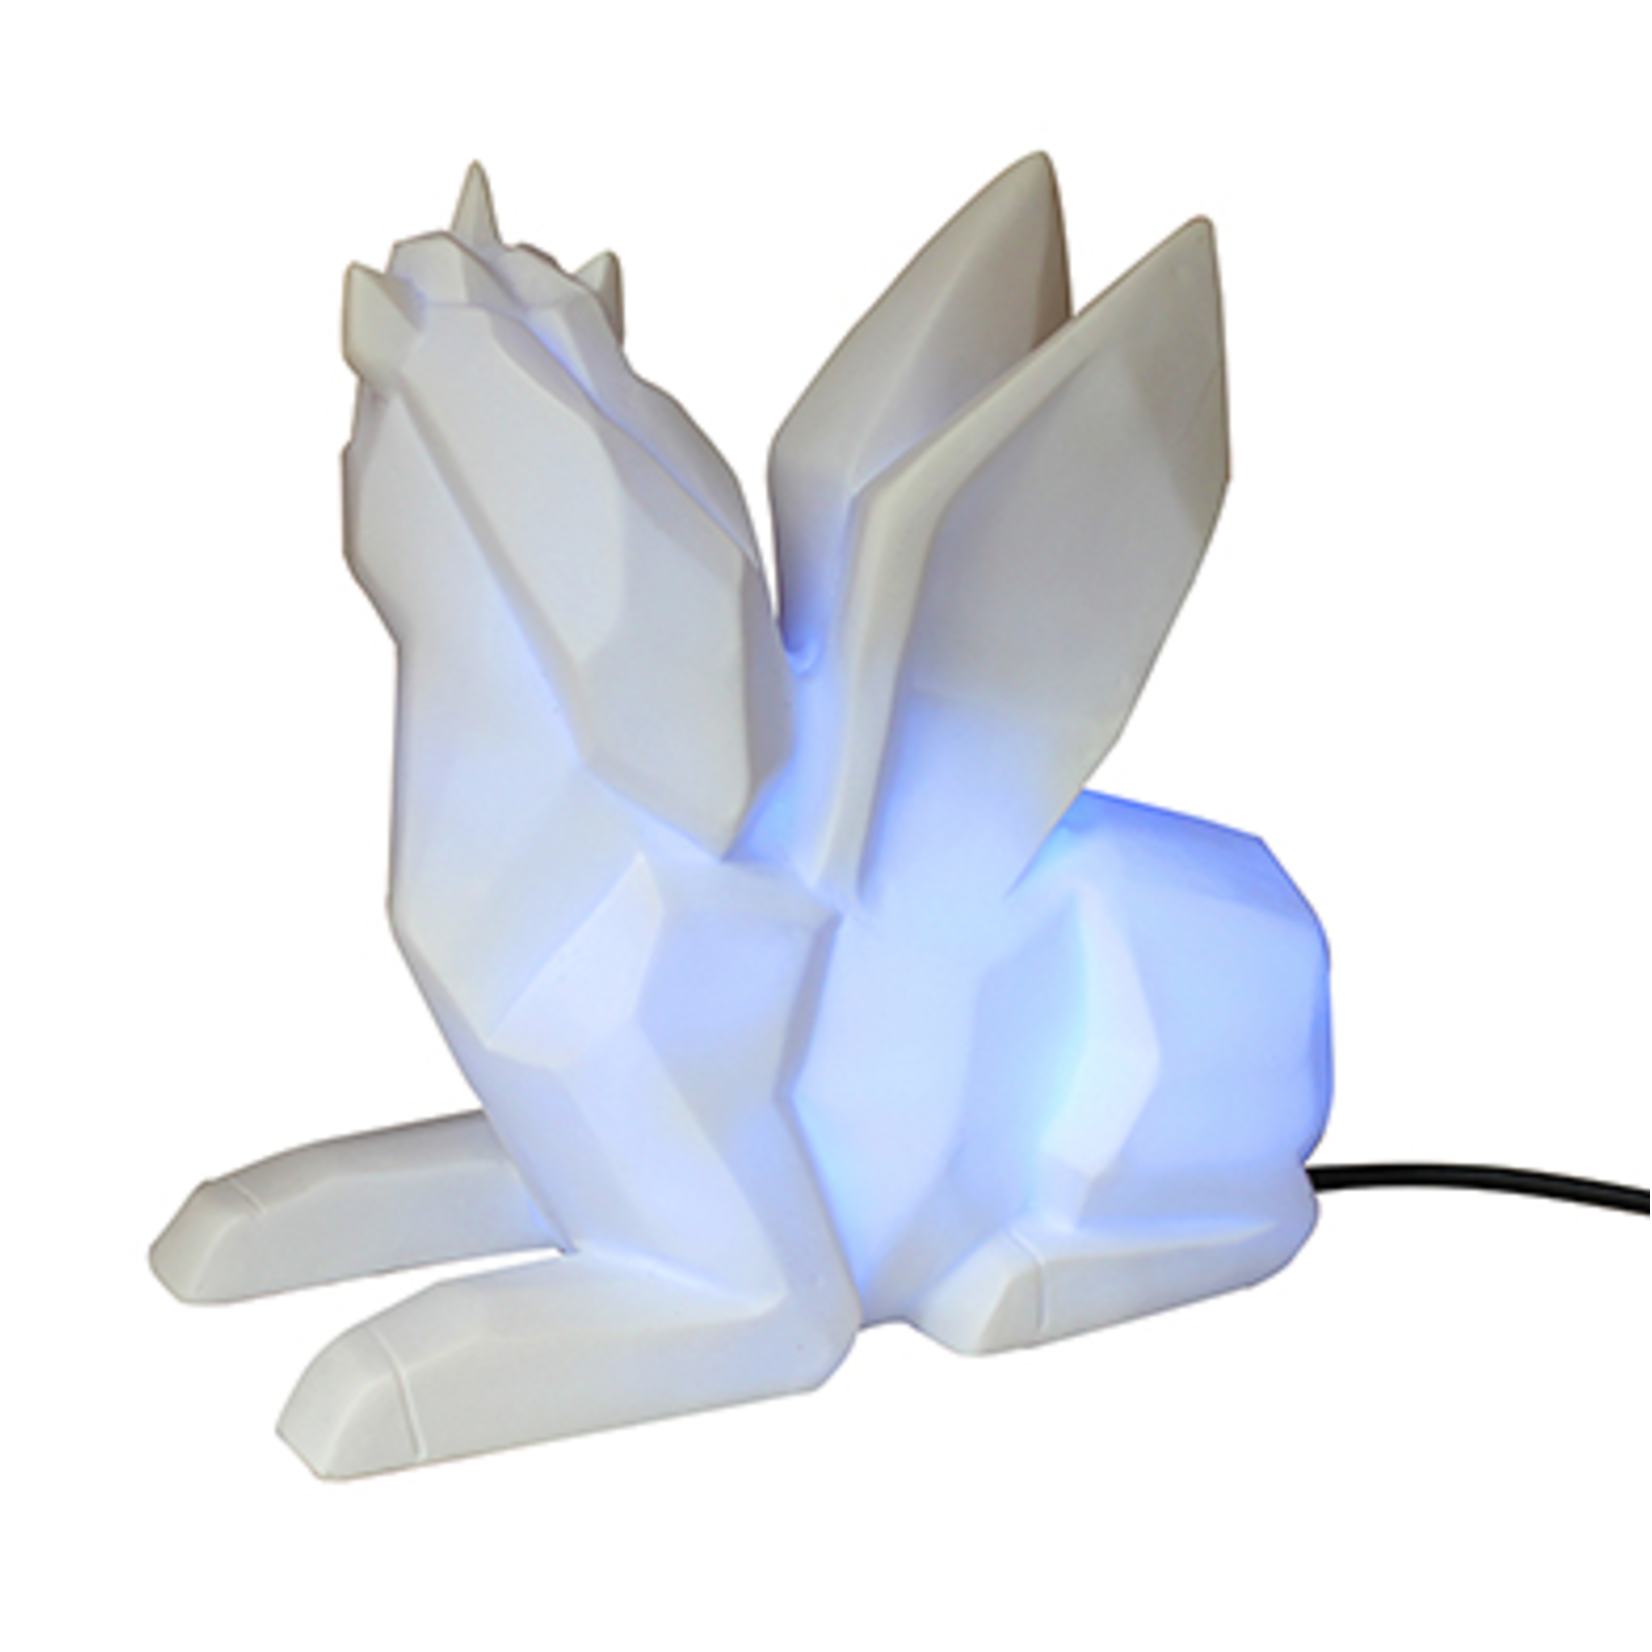 Disaster Designs Colour Changing Unicorn Lamp UK PLUG